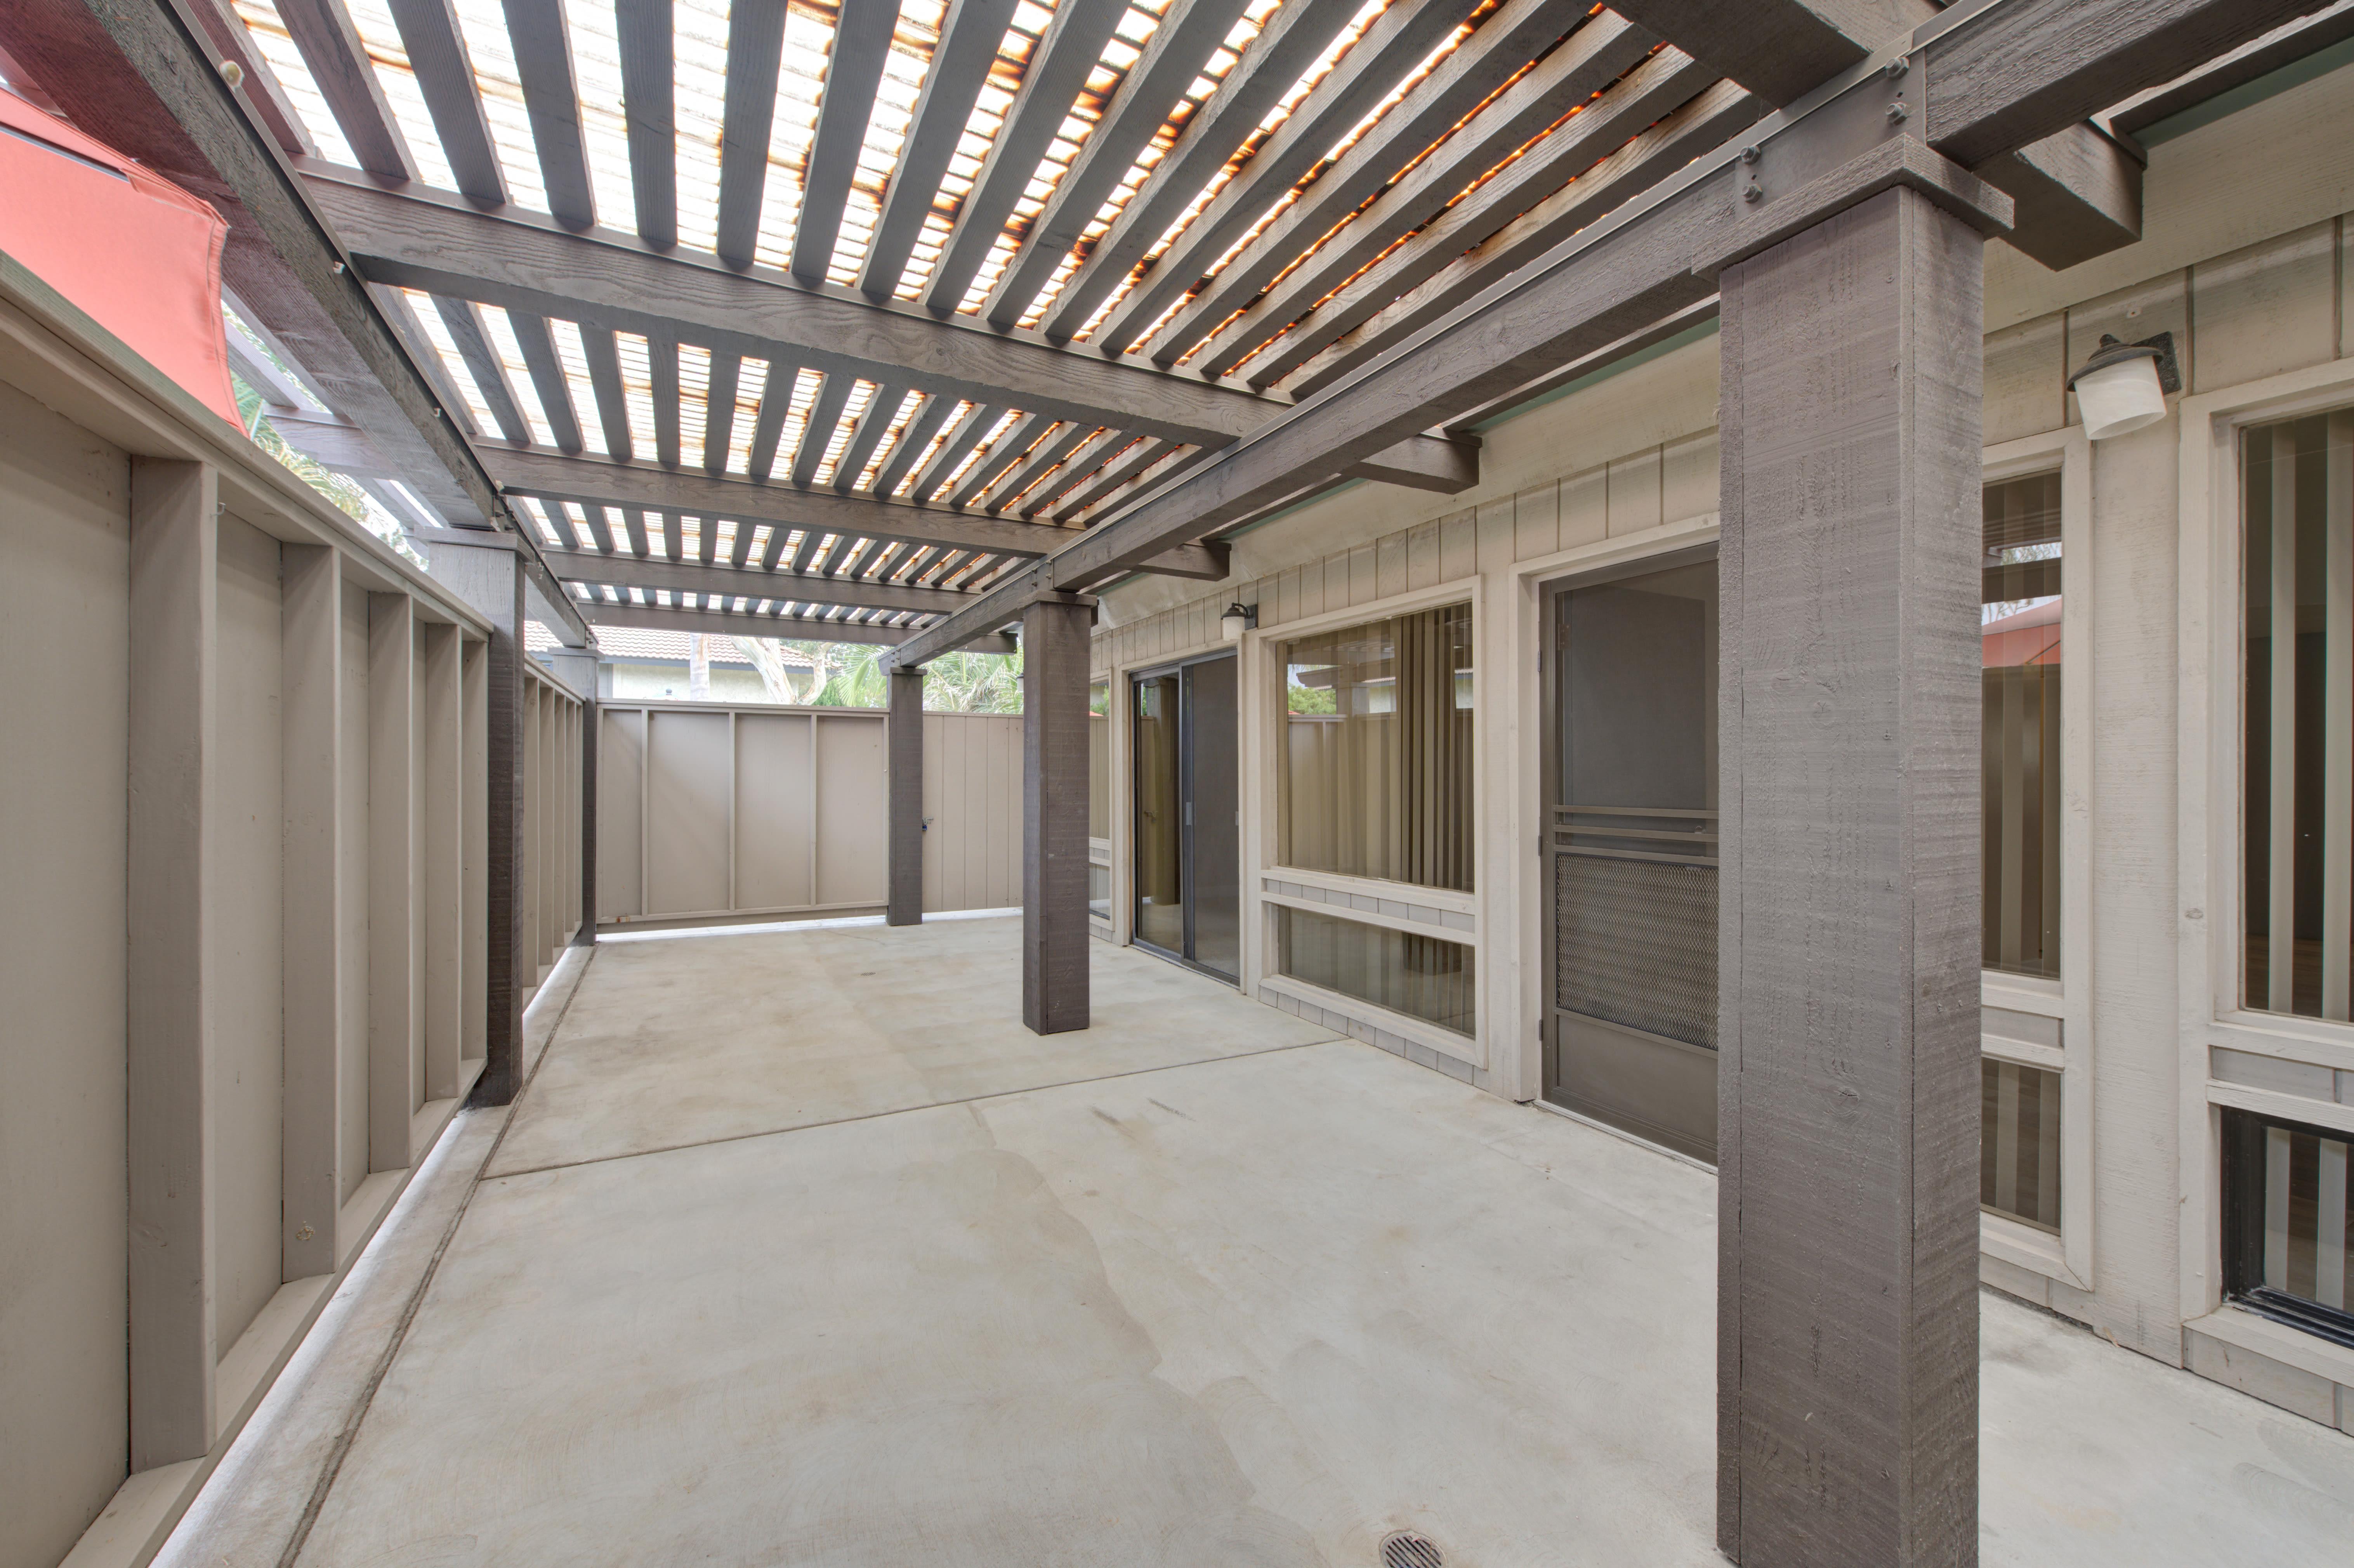 Apartments with private outdoor patios at Sofi Ventura in Ventura, California